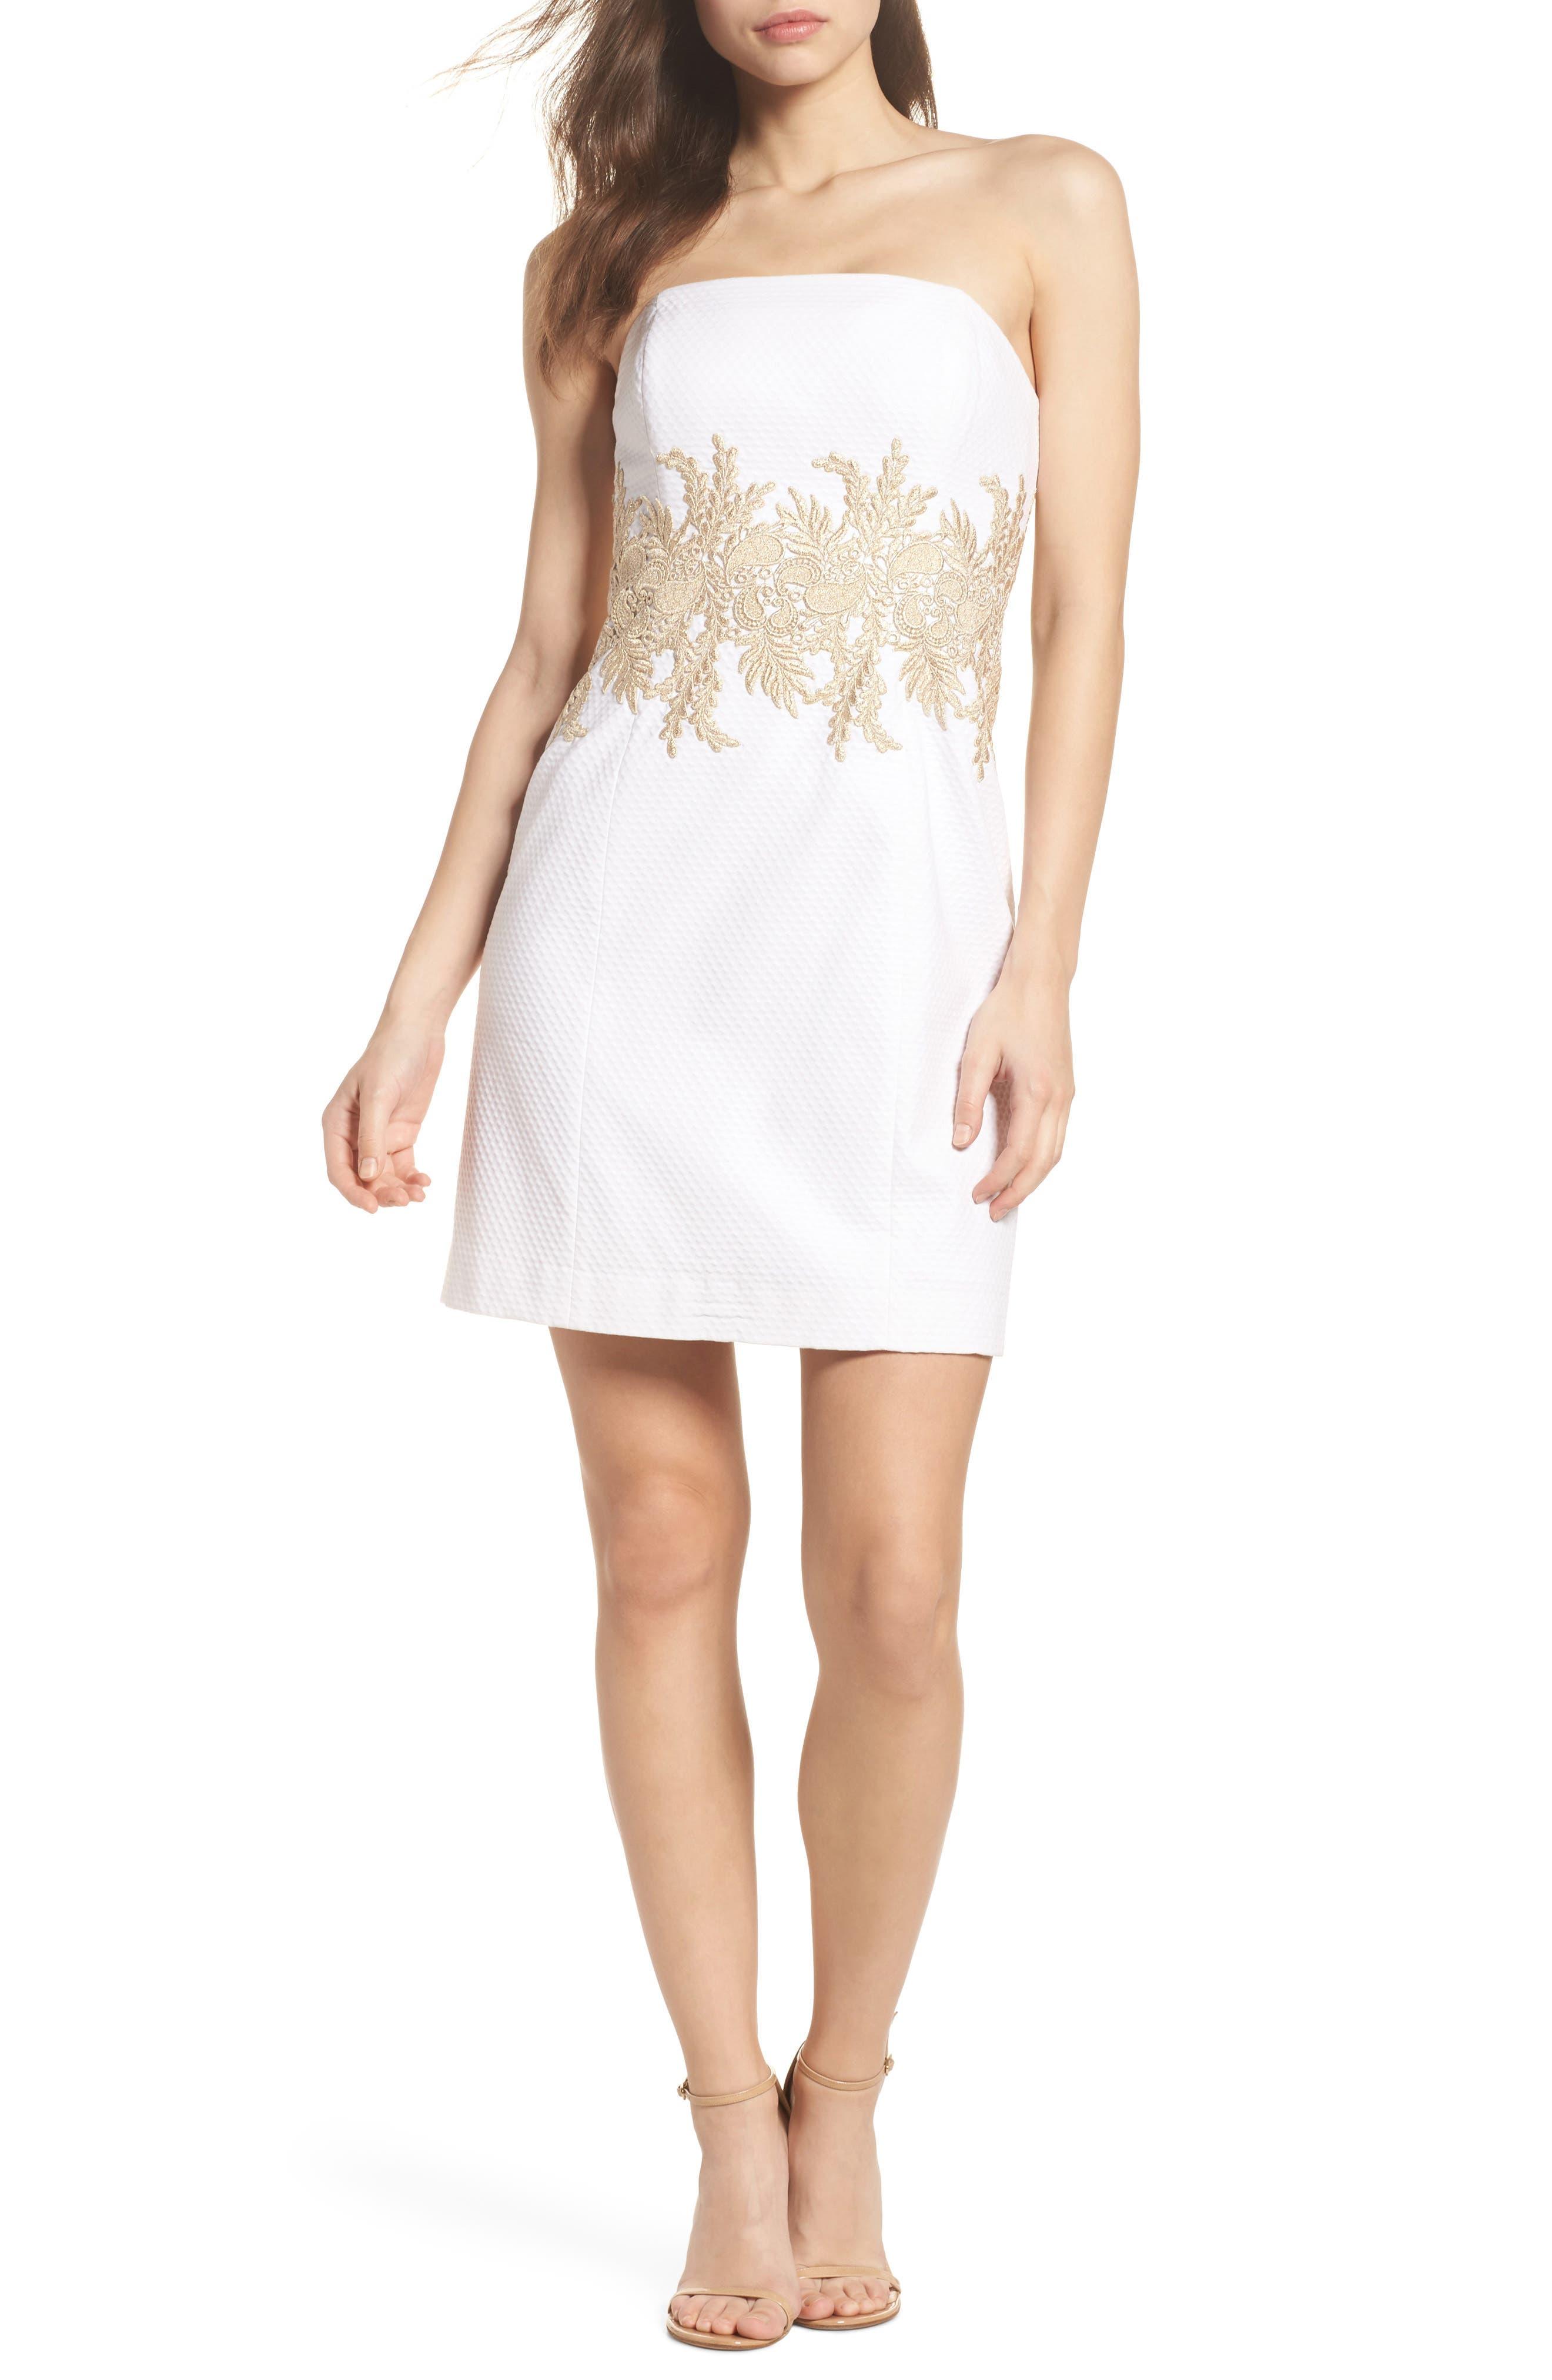 Lilly Pulitzer® Kade Strapless Dress